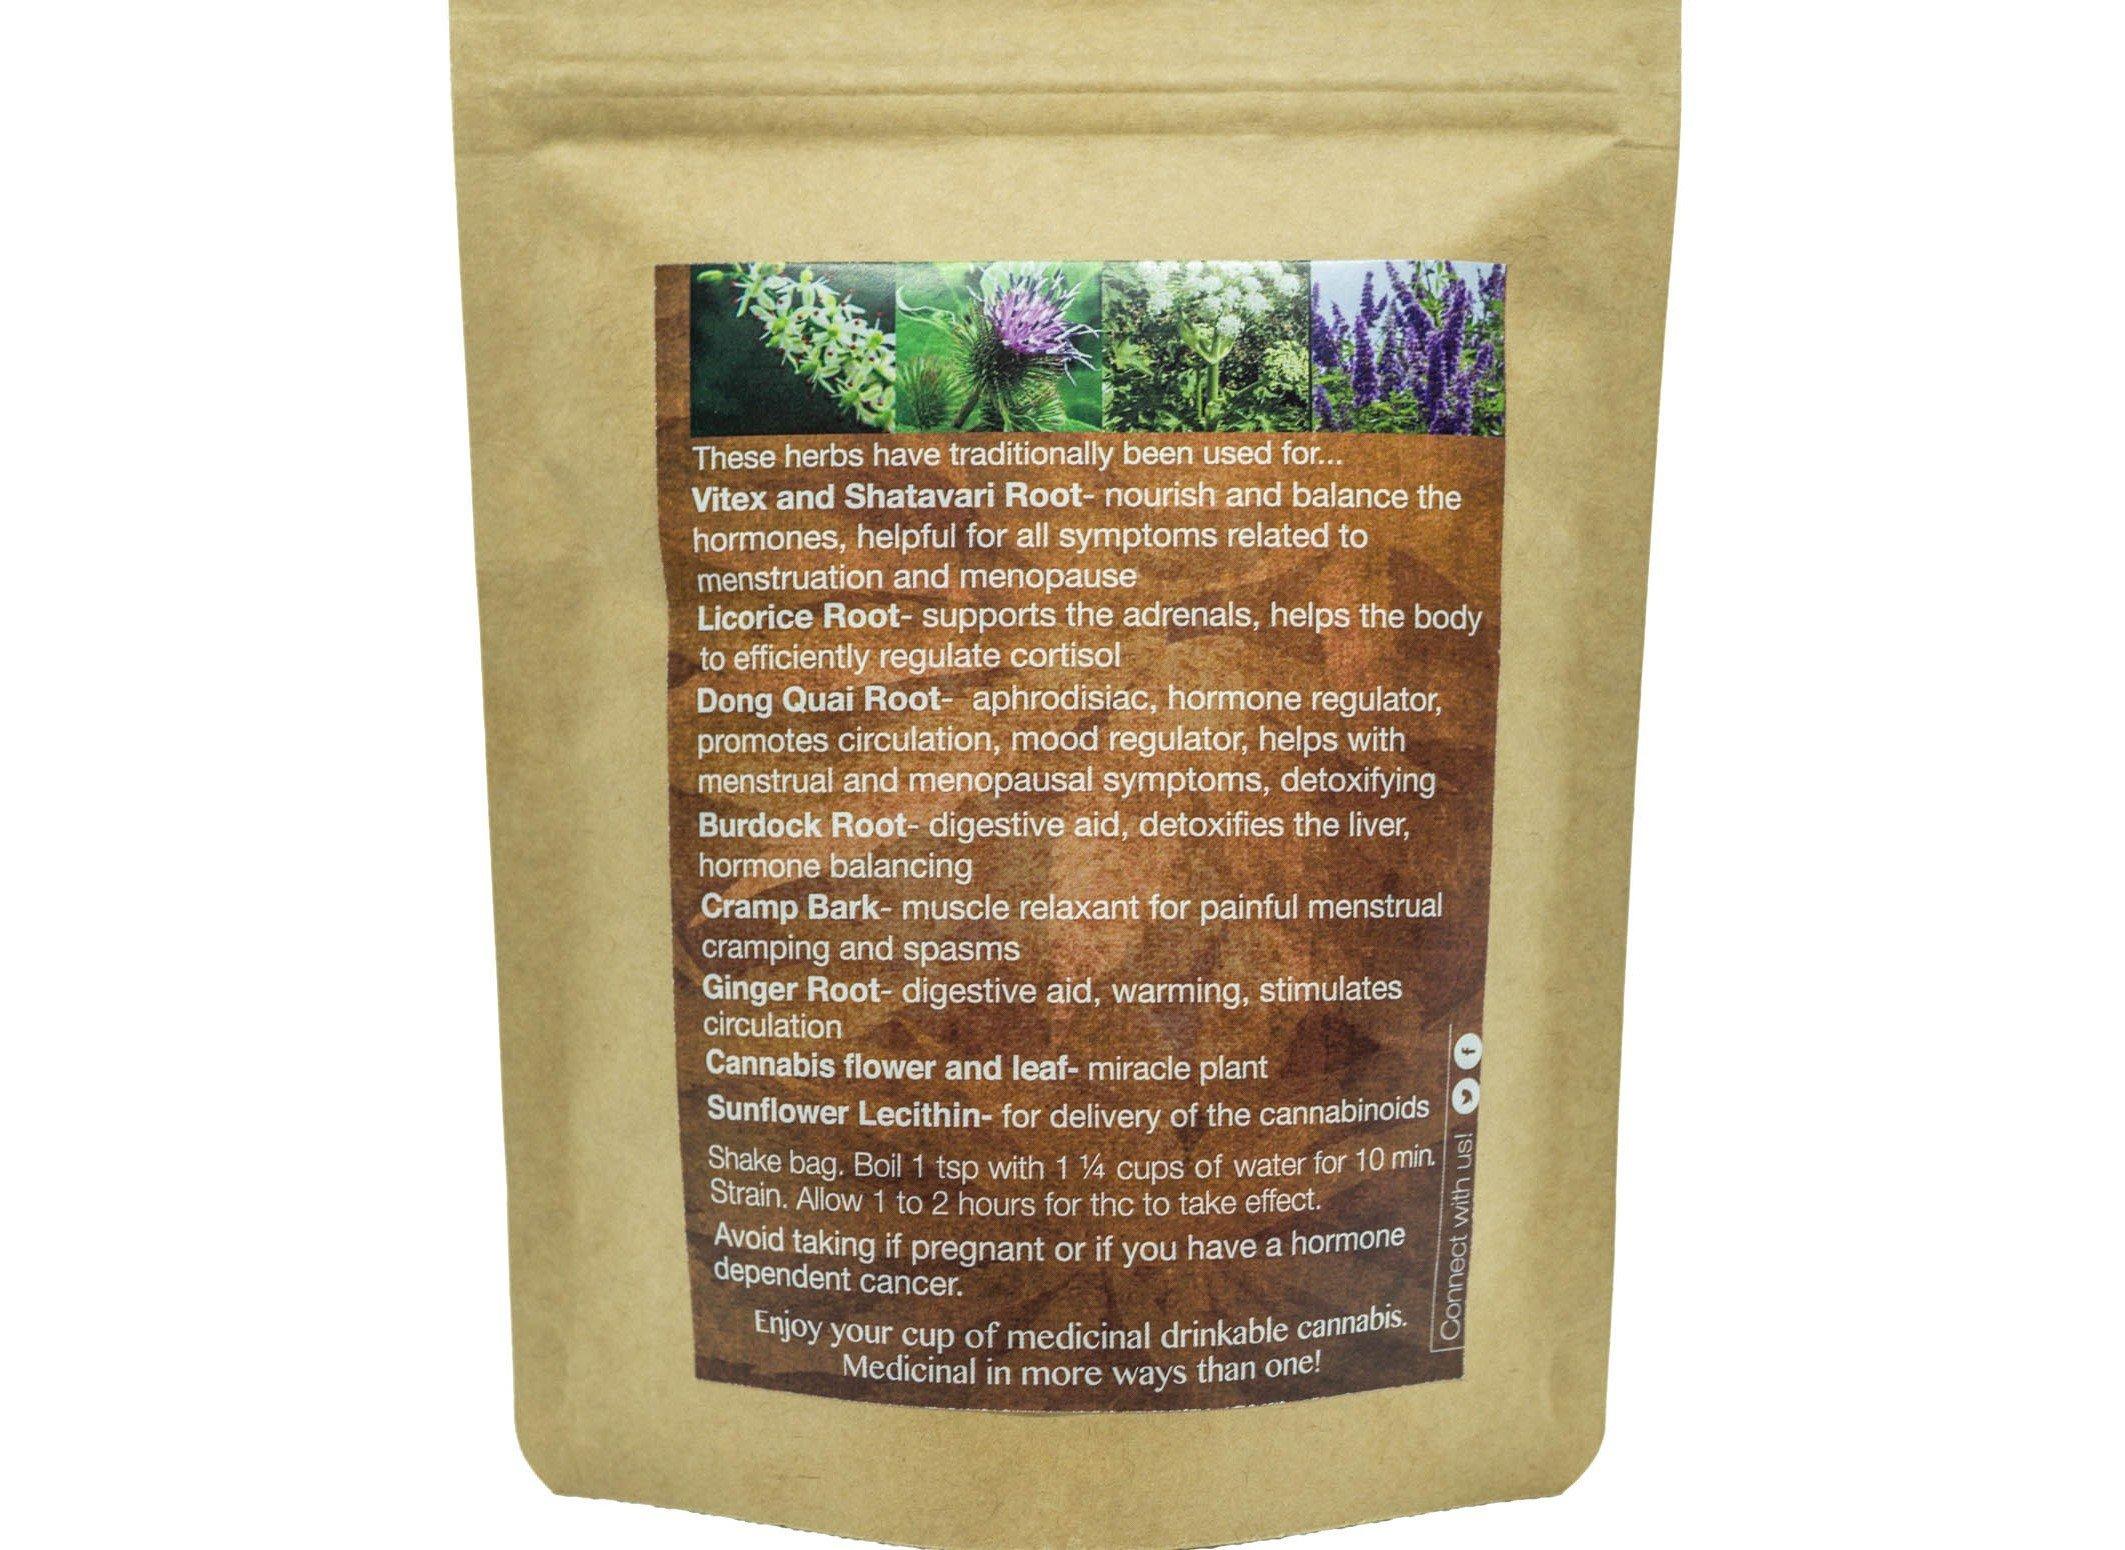 Women's Tea by MeadowSweet Herbs (220mg THC)